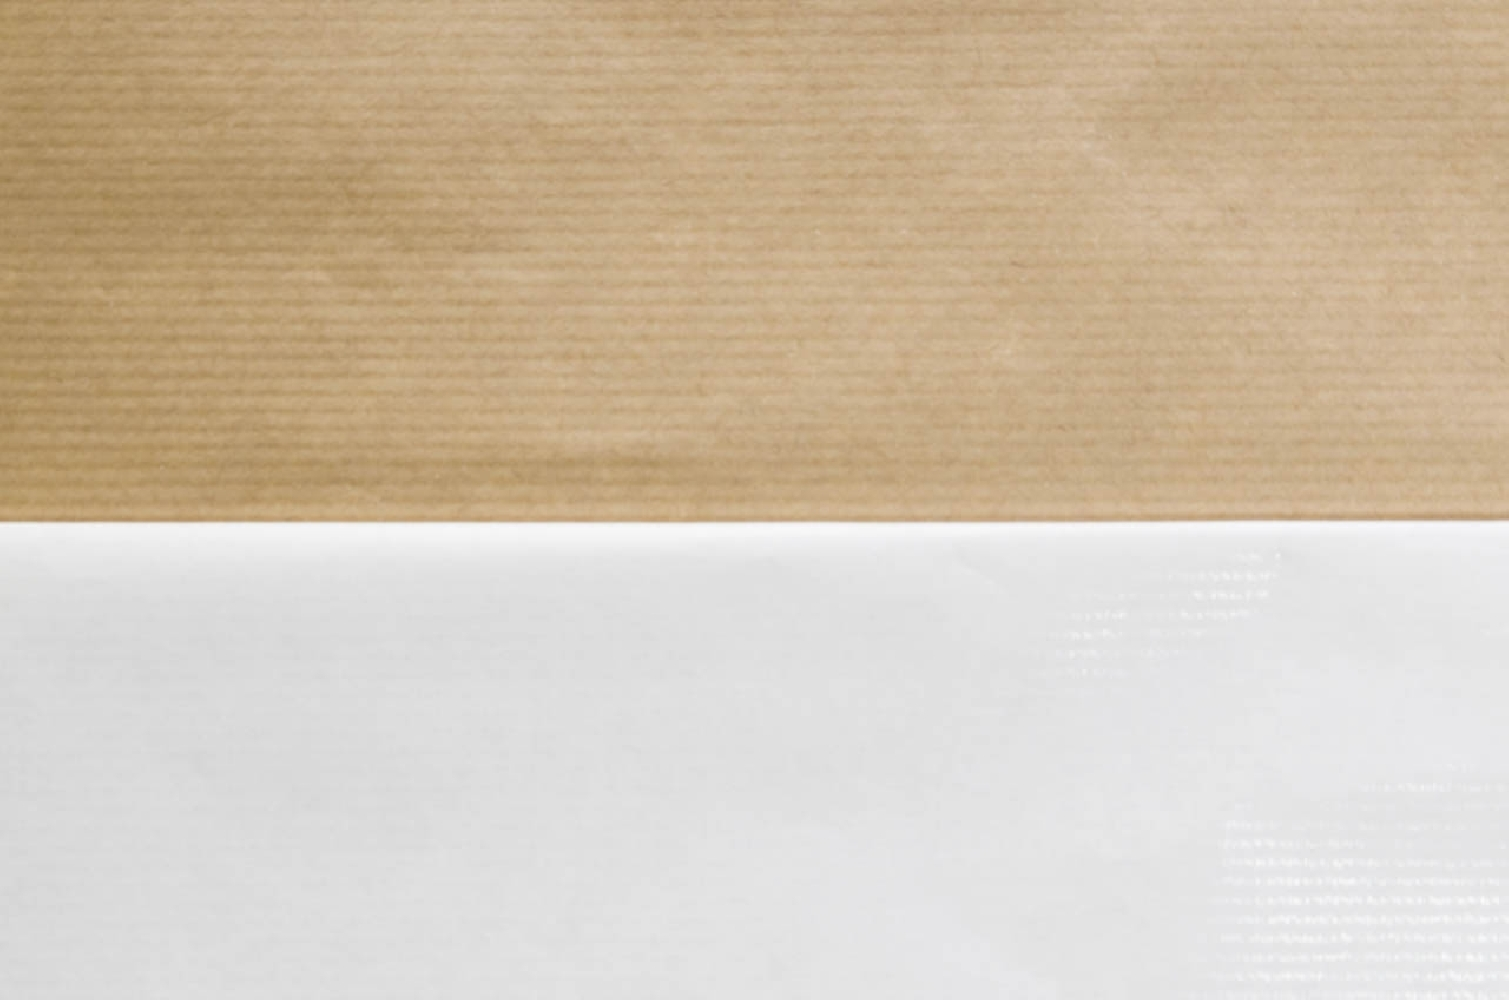 Carta da pacco (25 fogli)